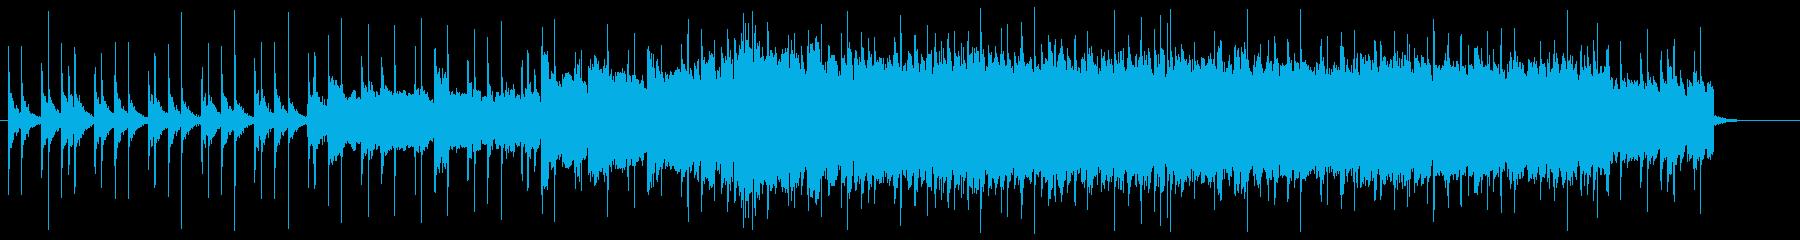 CM向けロックアンセム 30秒歌無版の再生済みの波形